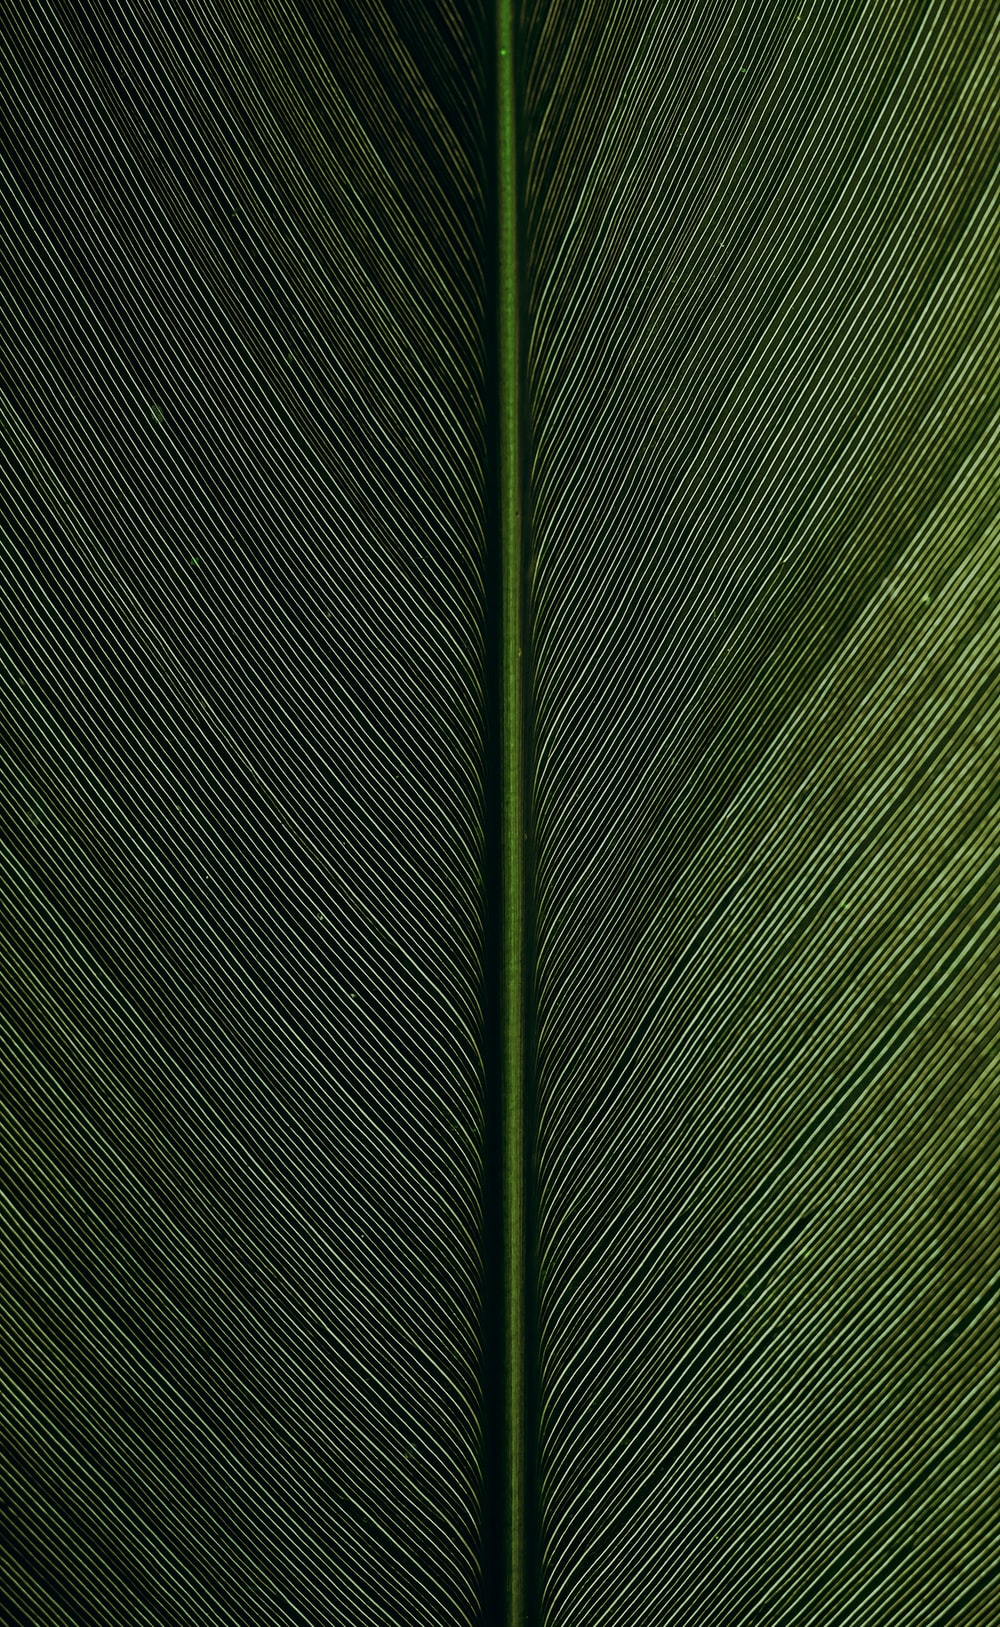 green metal rod on black and white pinstripe textile